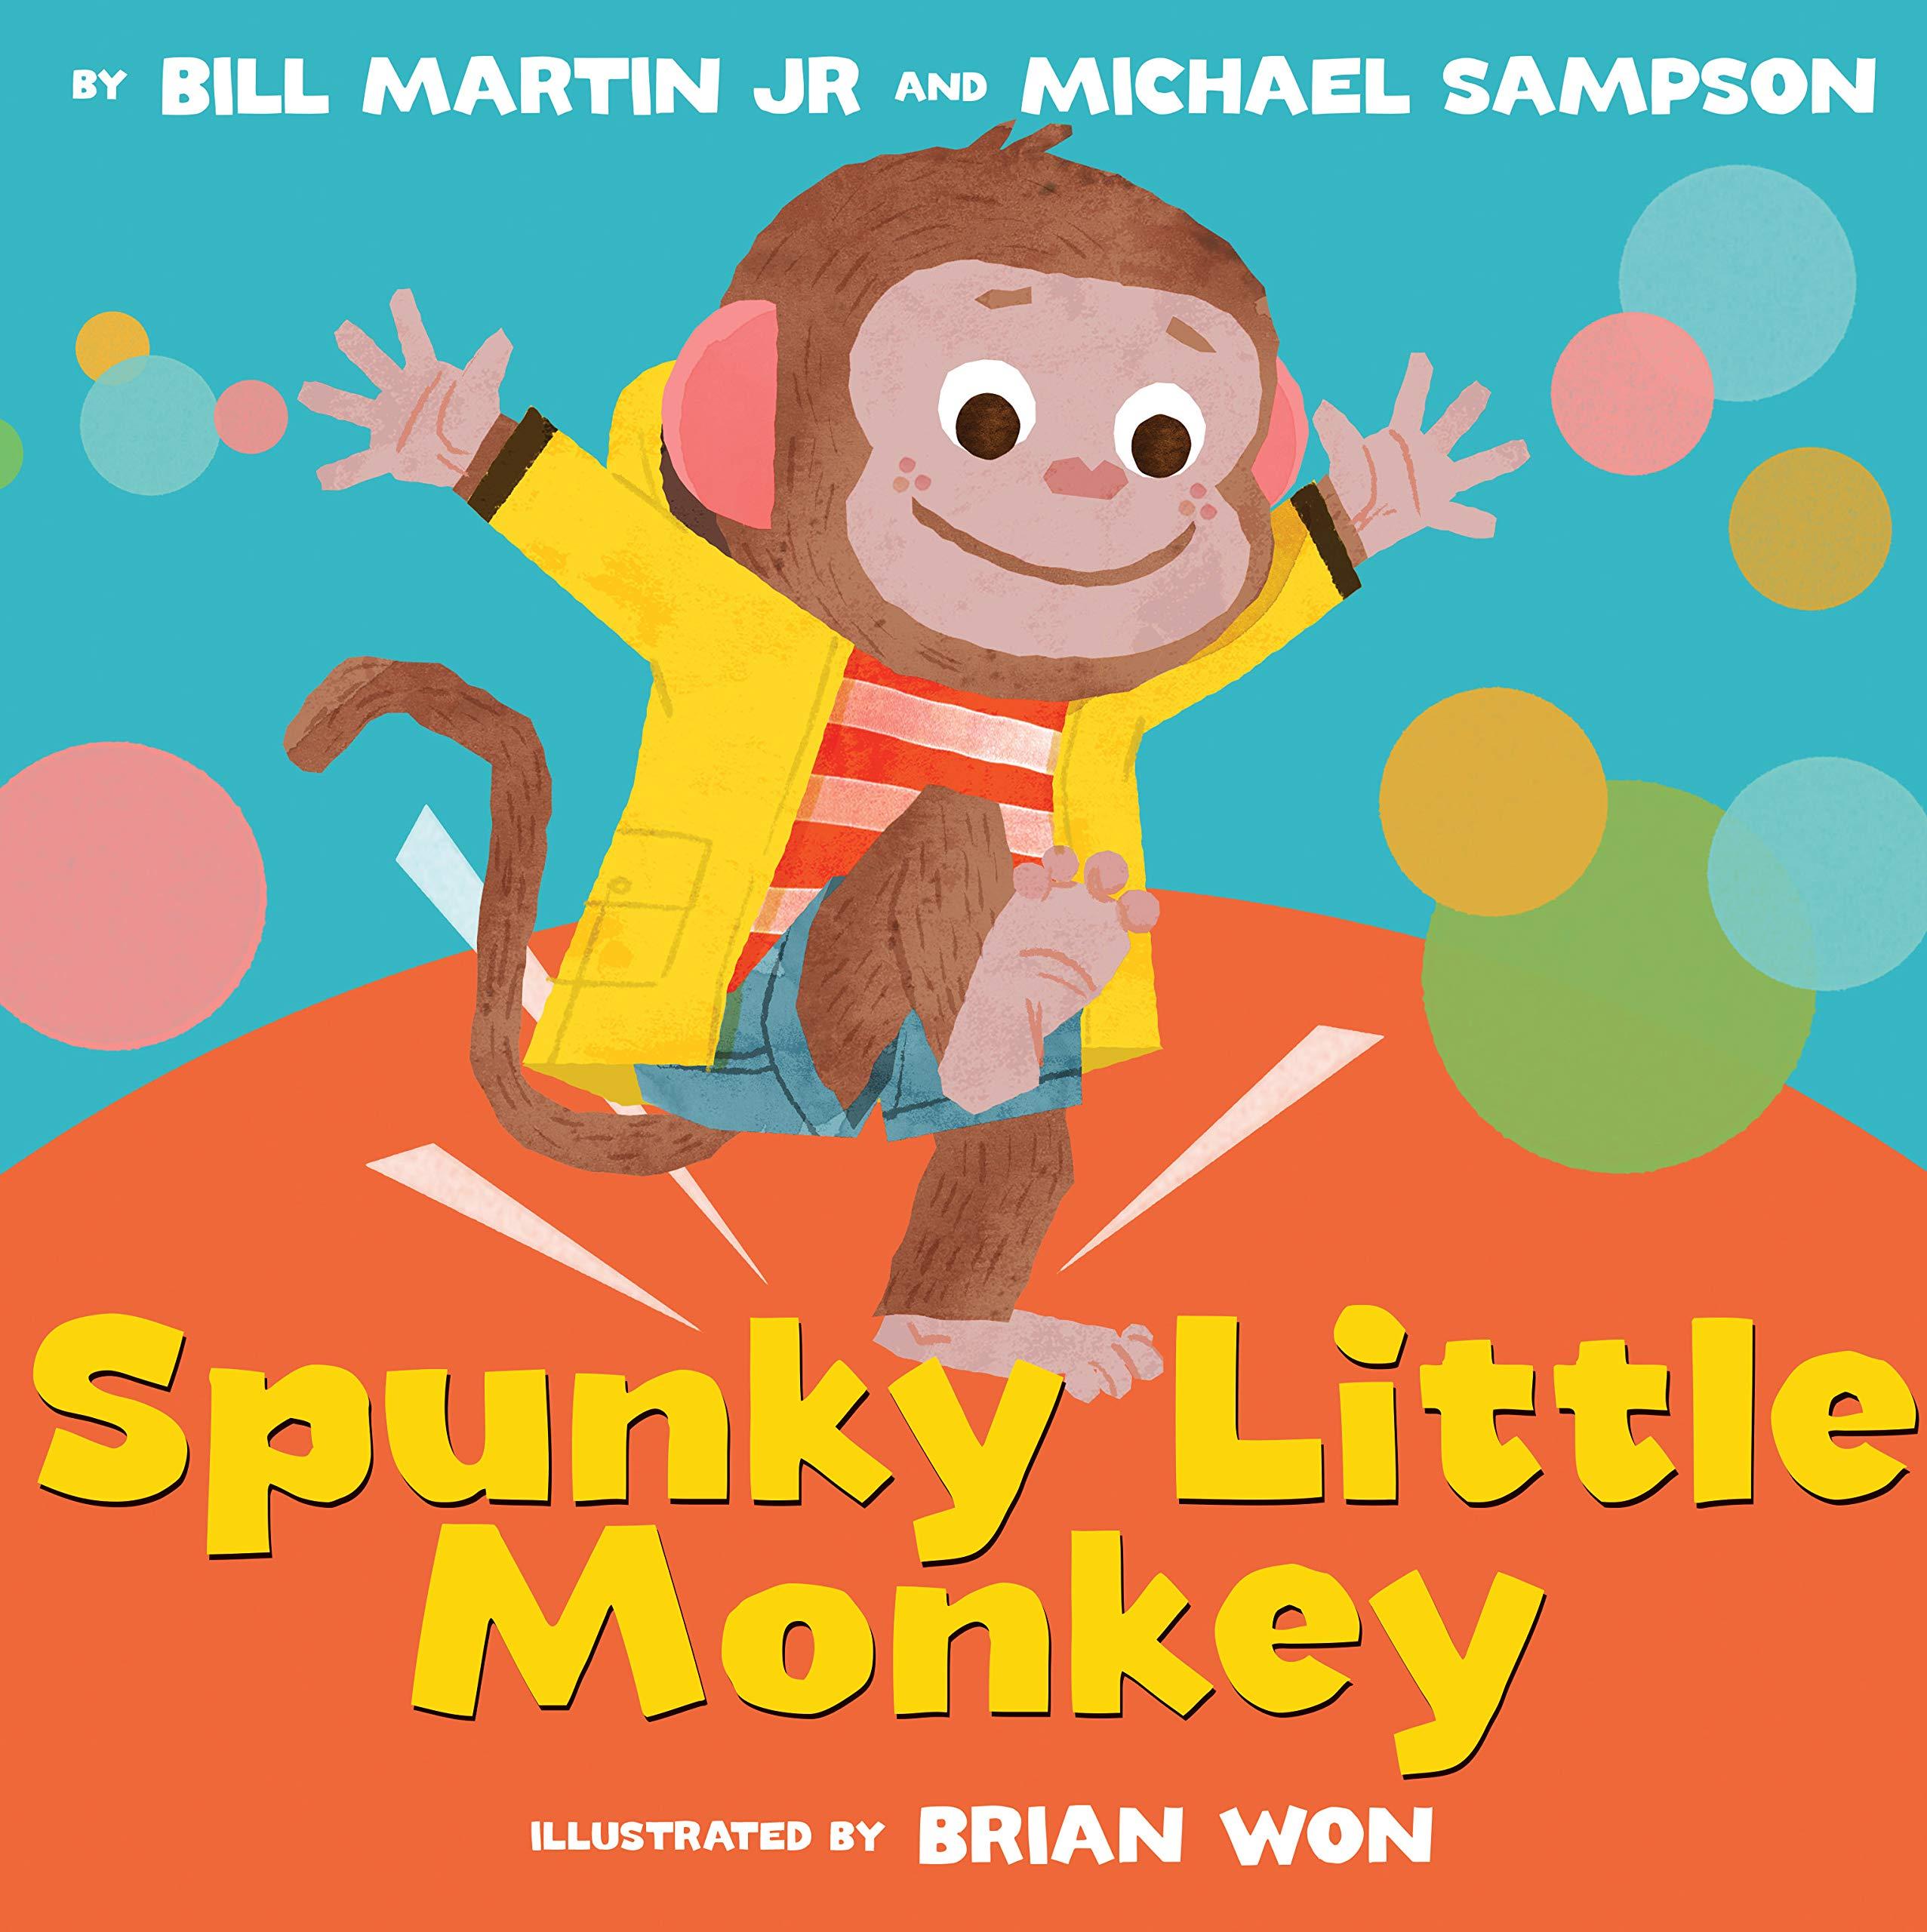 Amazon.com: Spunky Little Monkey (9780545776431): Martin Jr., Bill,  Sampson, Michael, Won, Brian: Books